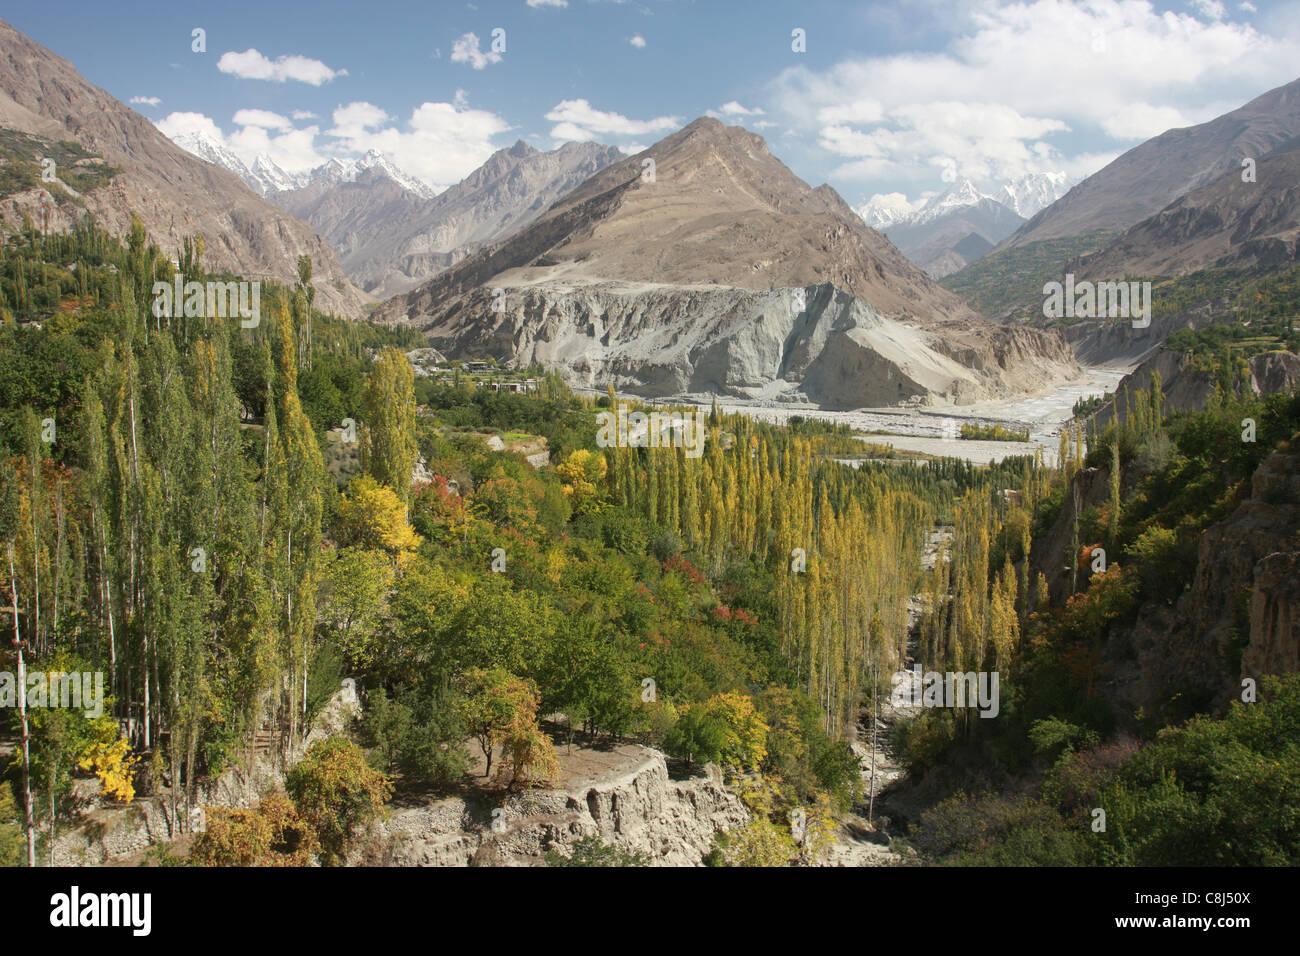 Hunza, Hunza-Valley, Karakoram, Karakoram-Highway, Pakistan, Asia, silk-road, Hindukush, Shangri-la, Hunzakut, Karimabad, - Stock Image